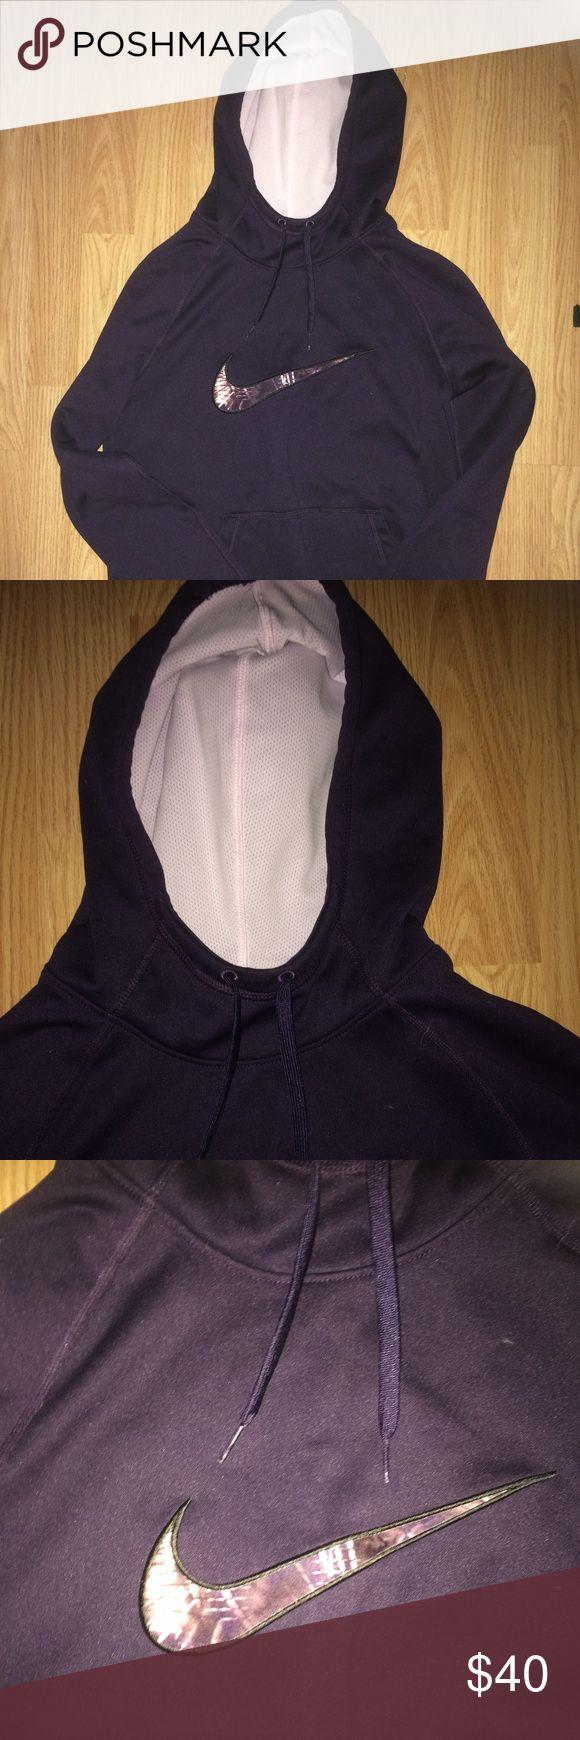 best 25 nike sweatshirts ideas on pinterest nikes for